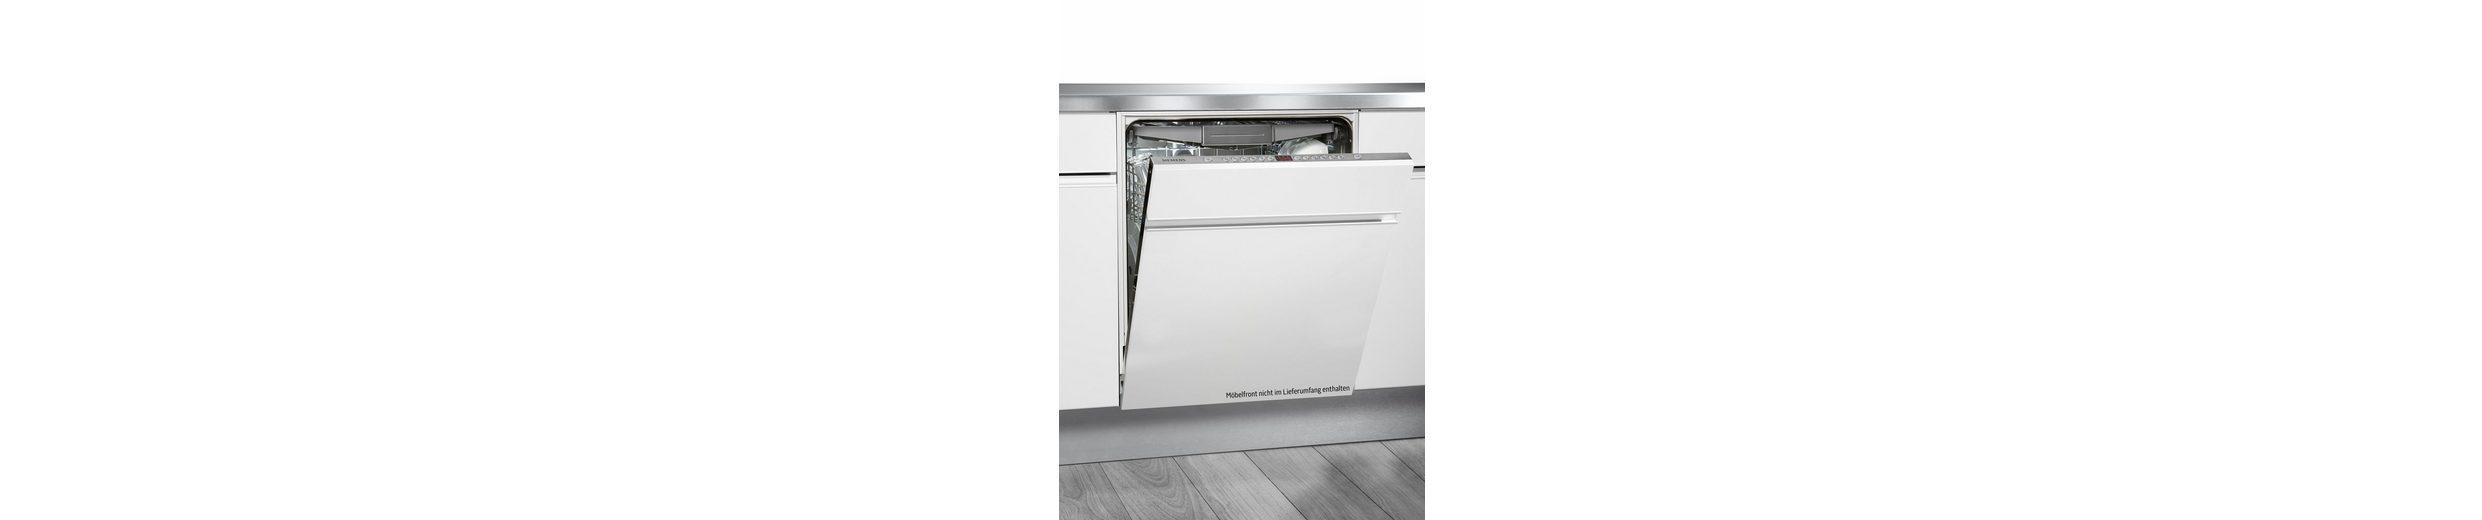 SIEMENS Vollintegrierbarer Einbaugeschirrspüler iQ500  ~ Geschirrspülmaschine Zeolith